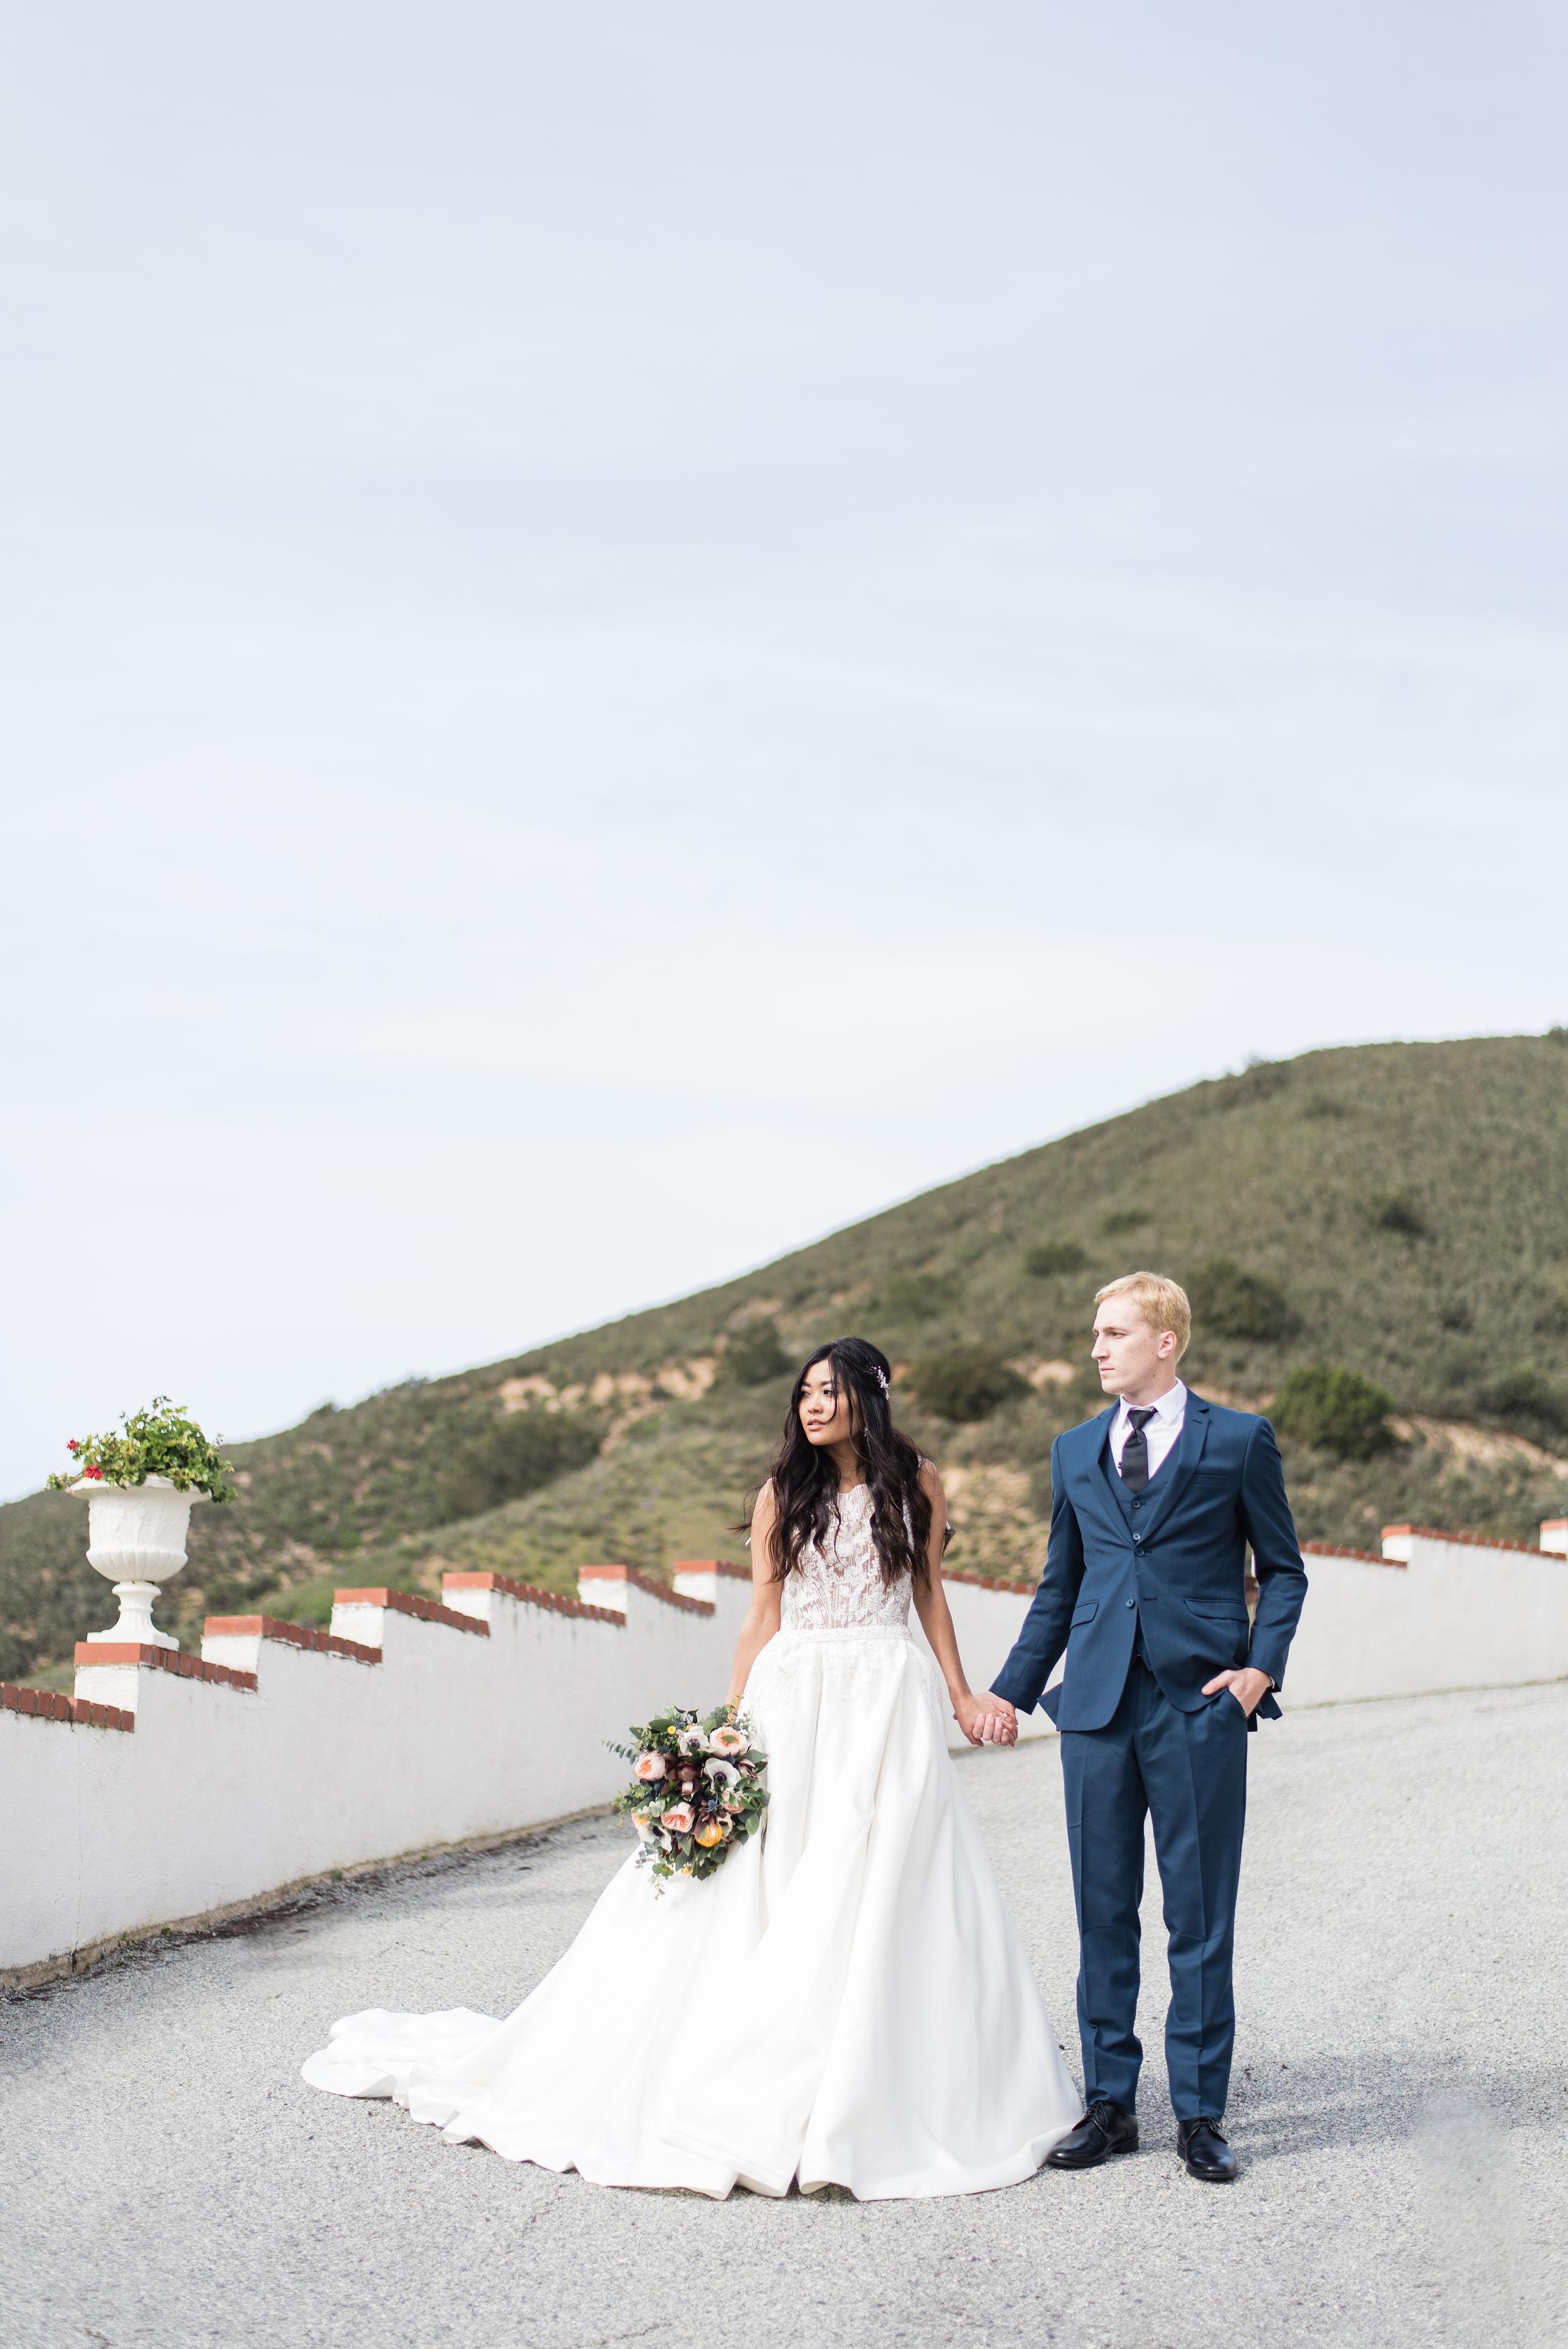 KMC weddings and events - cincinnati wedding coordinator